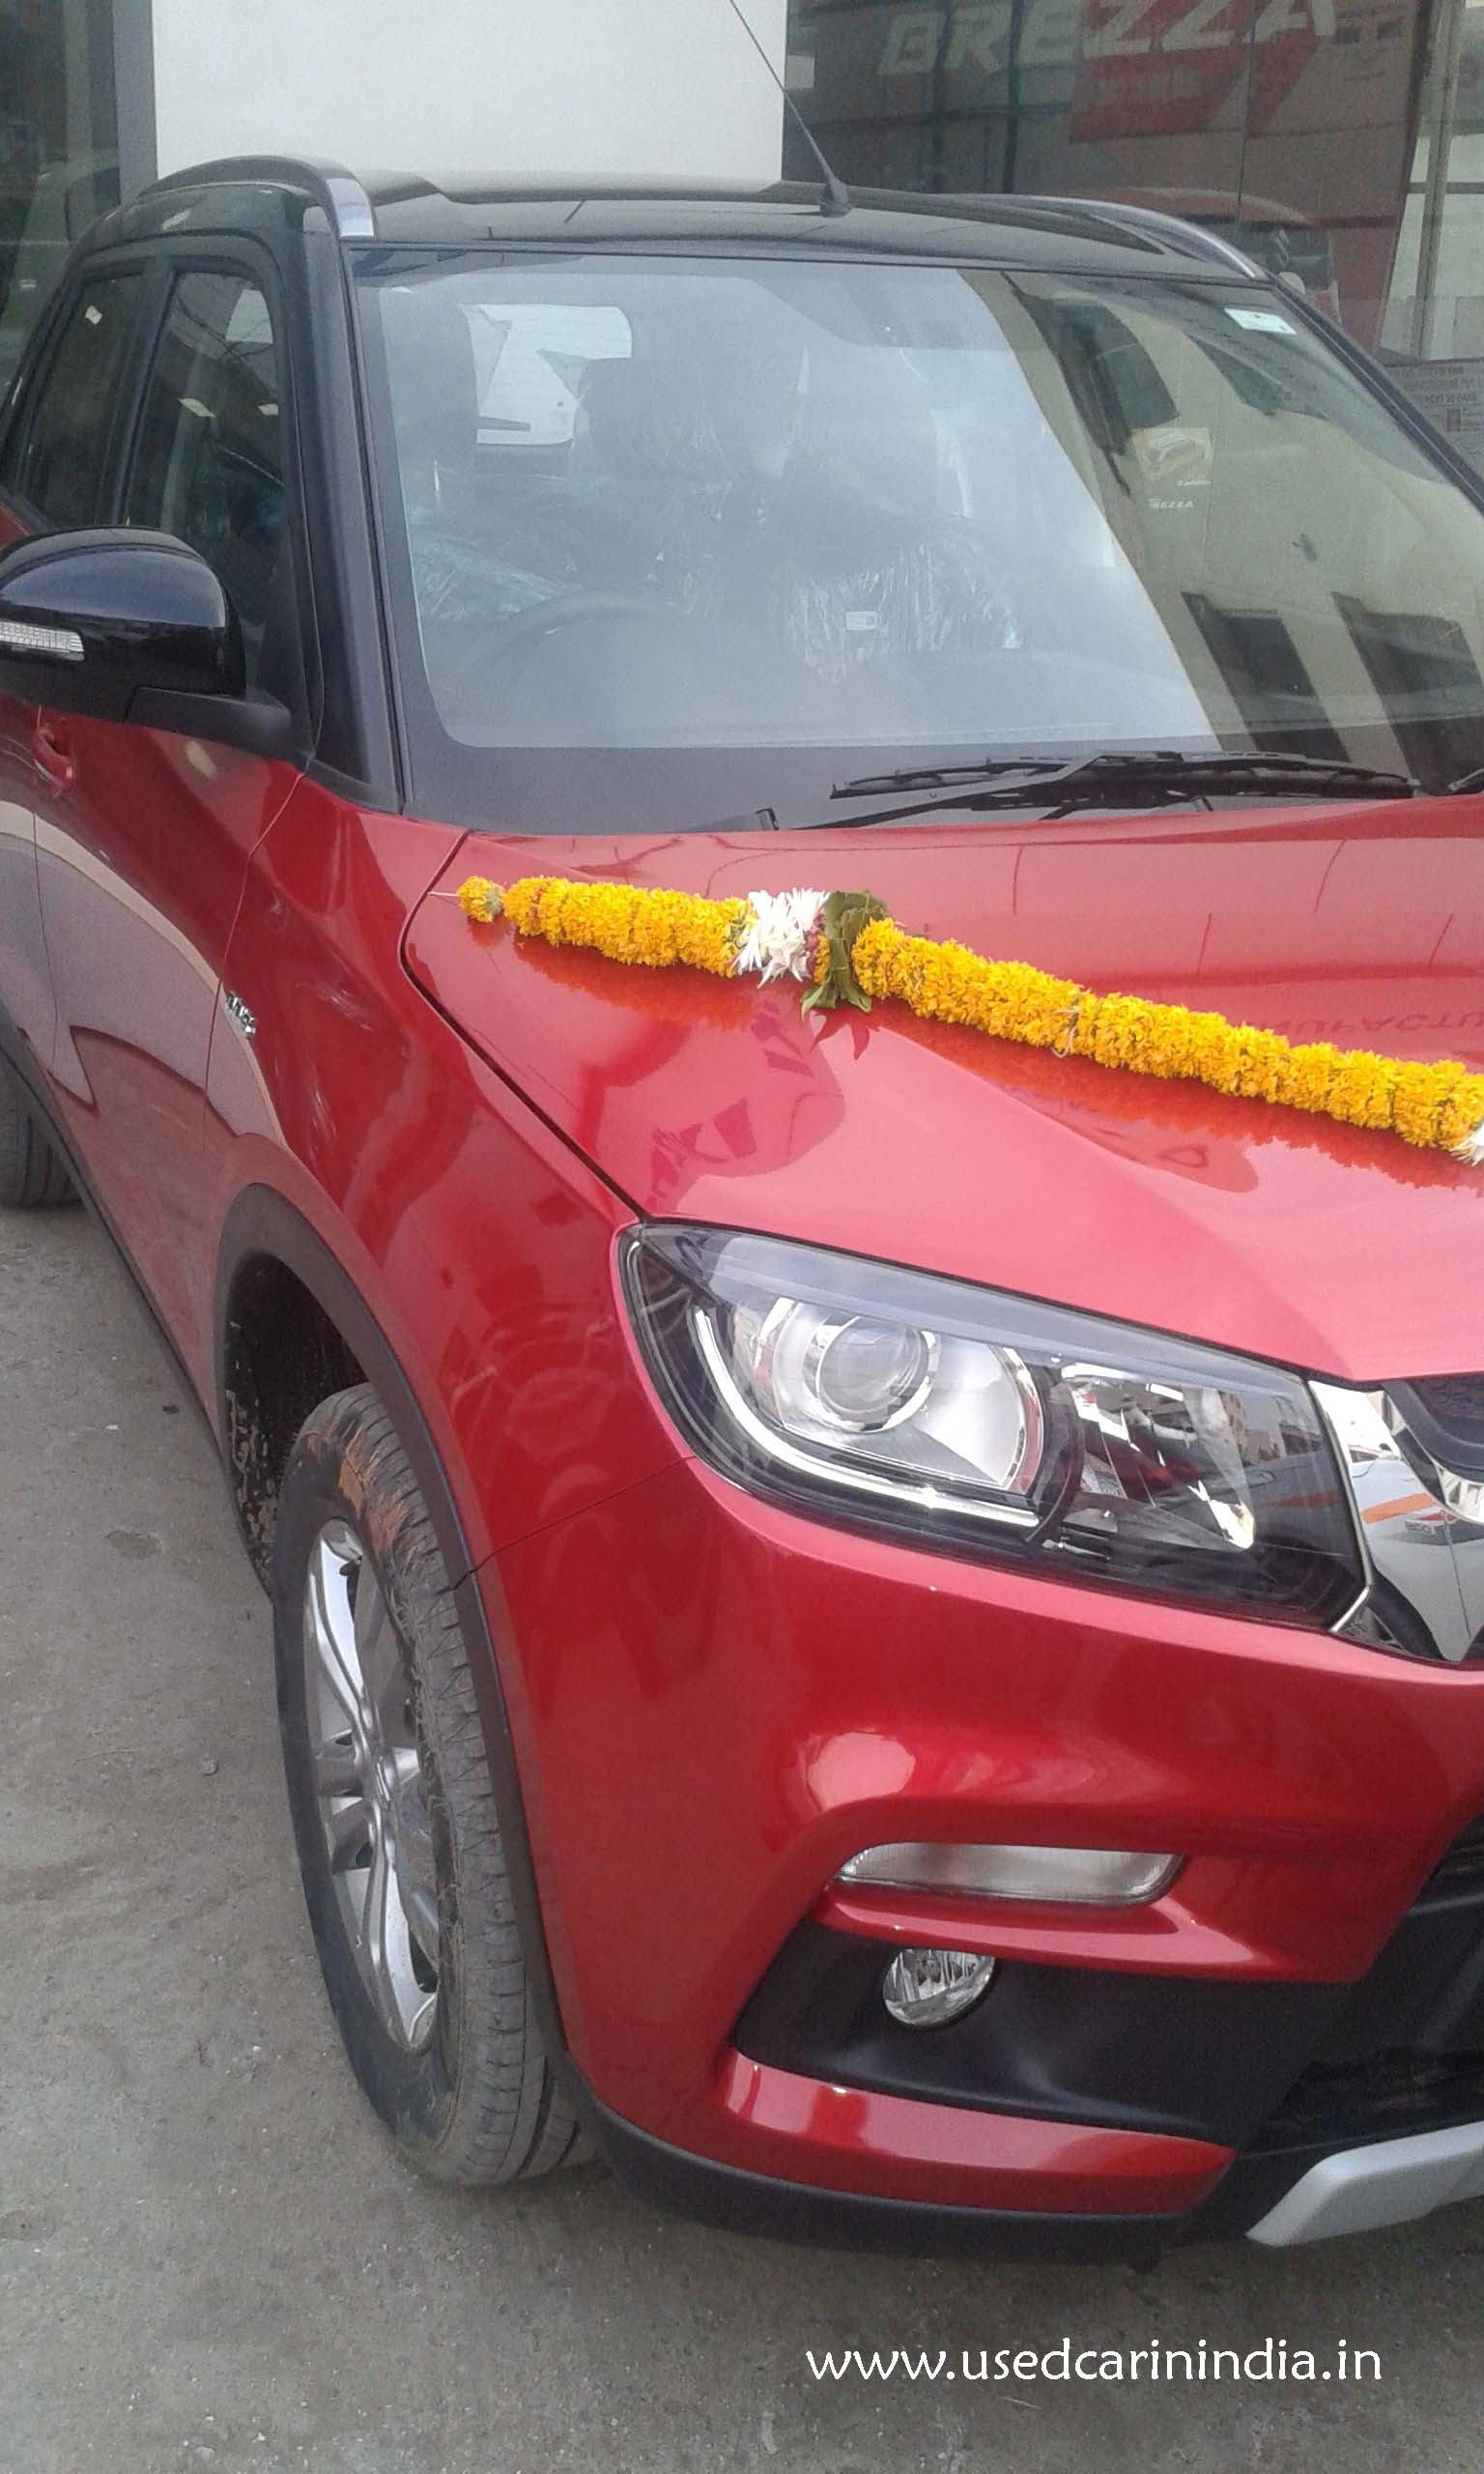 2016 New Maruti Vitara First Look In My City Used Car In